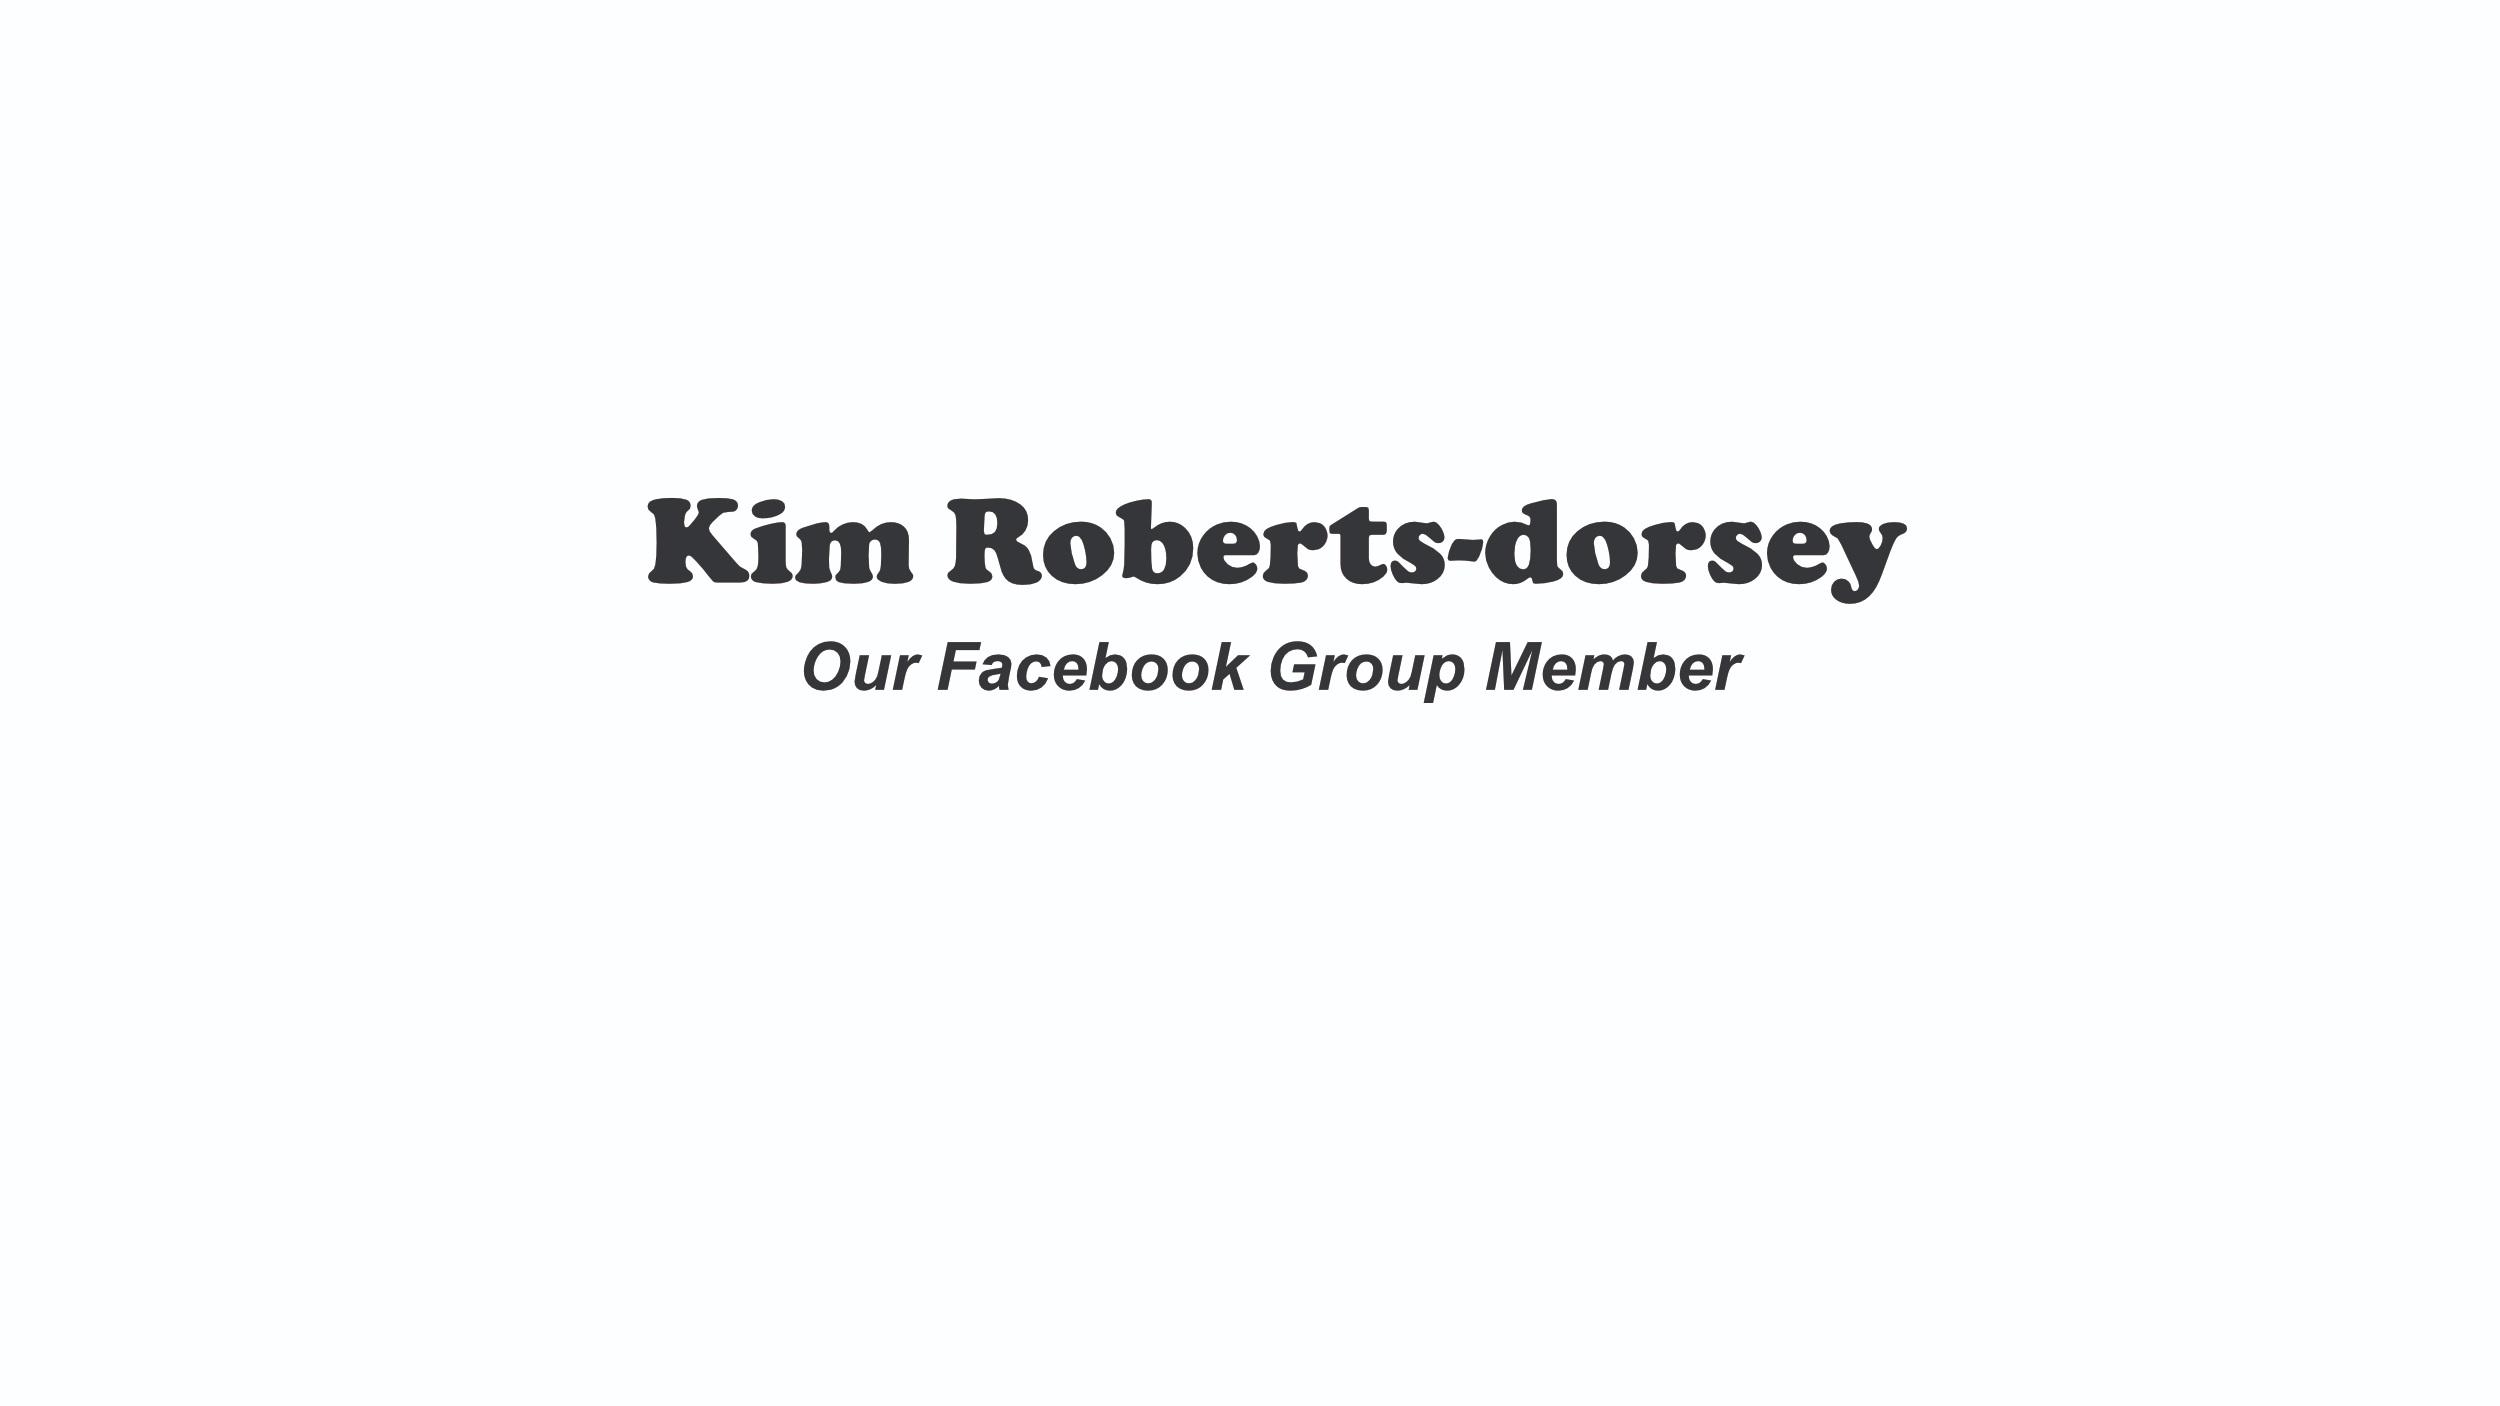 Kim Roberts-dorsey.jpg